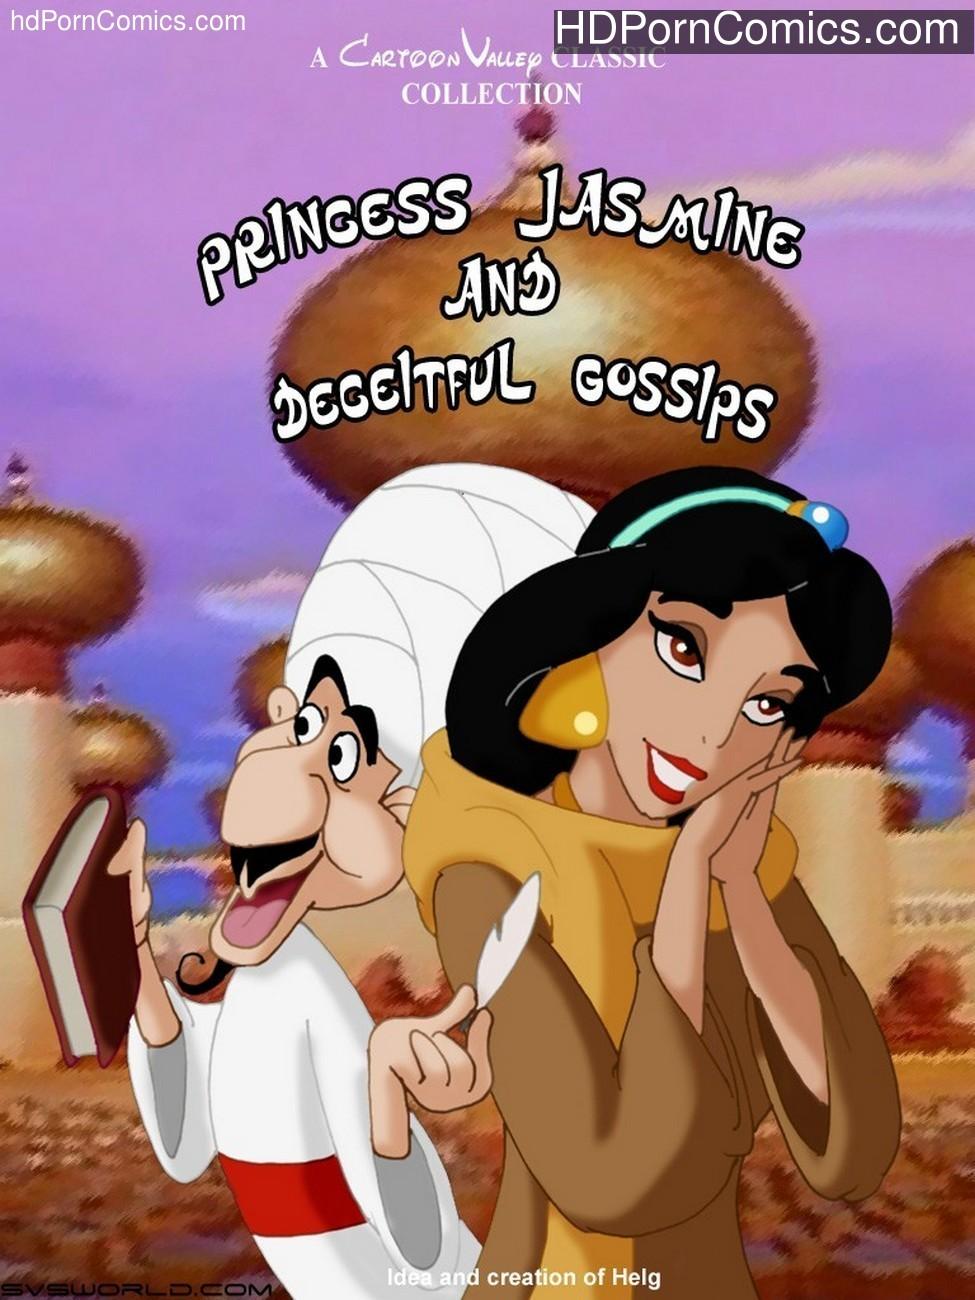 Princess Jasmine And Deceitful Gossips 1 free sex comic